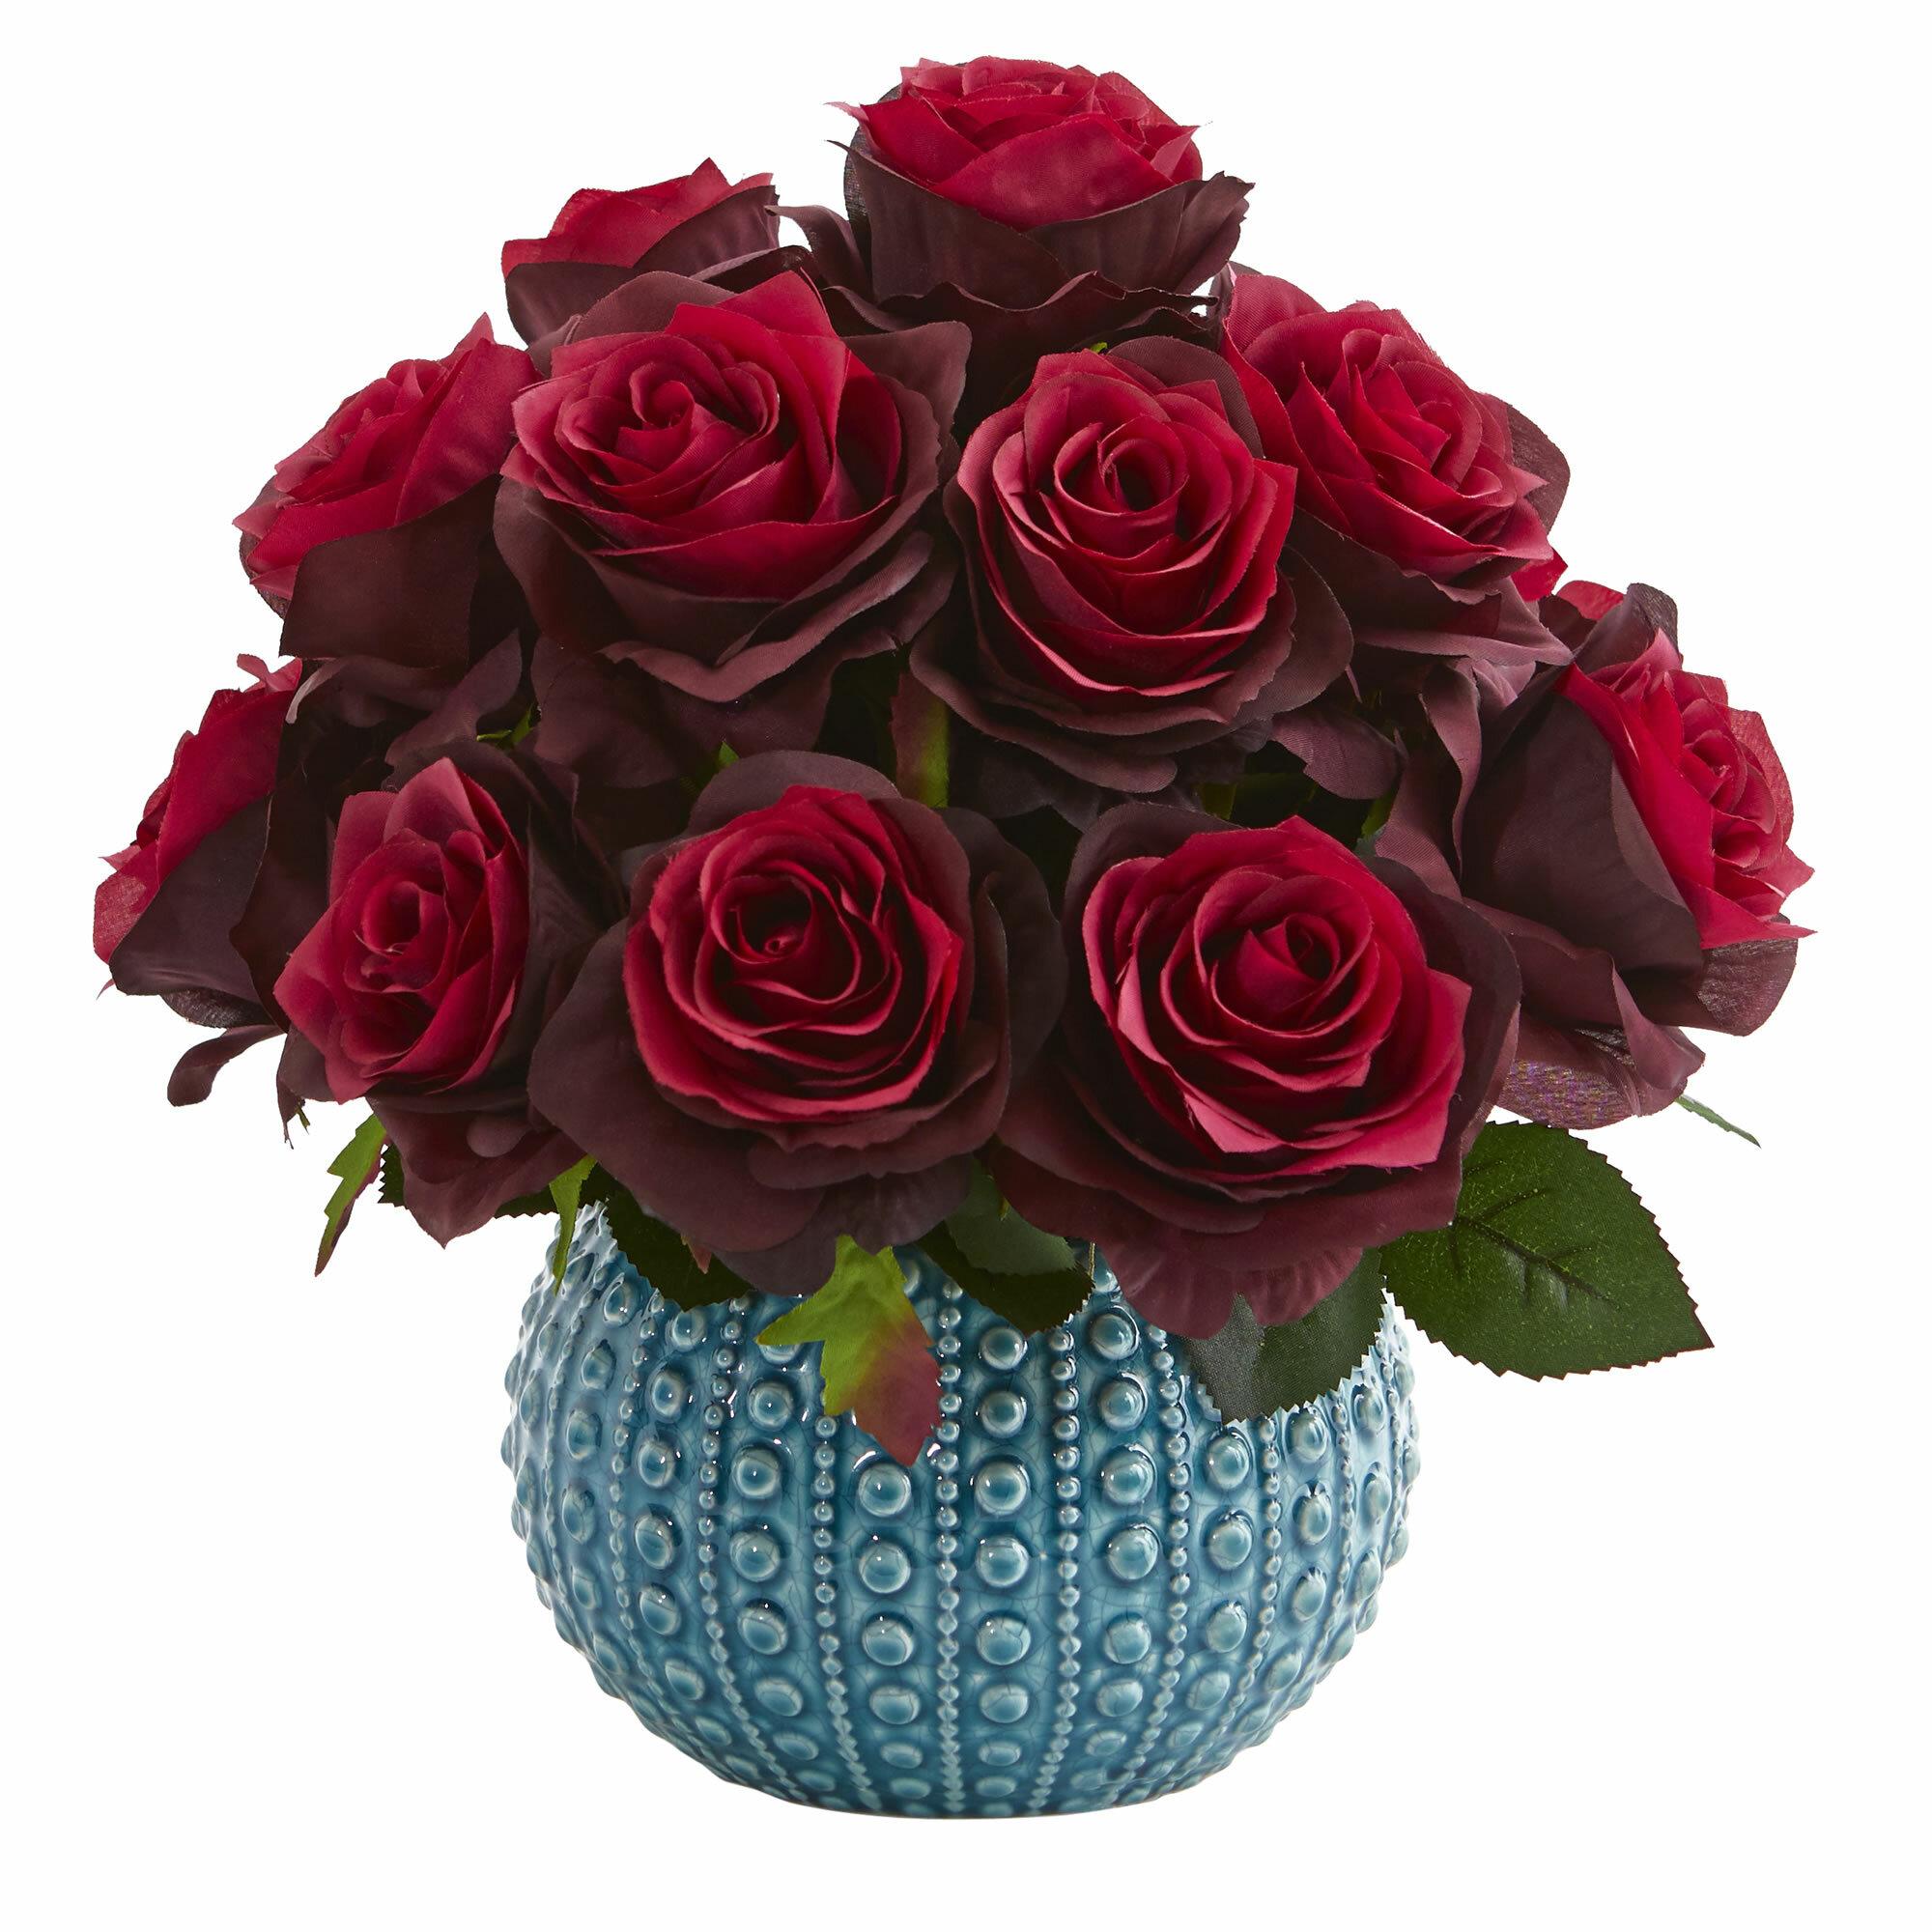 Rose Artificial Floral Arrangement In Ceramic Vase Reviews Joss